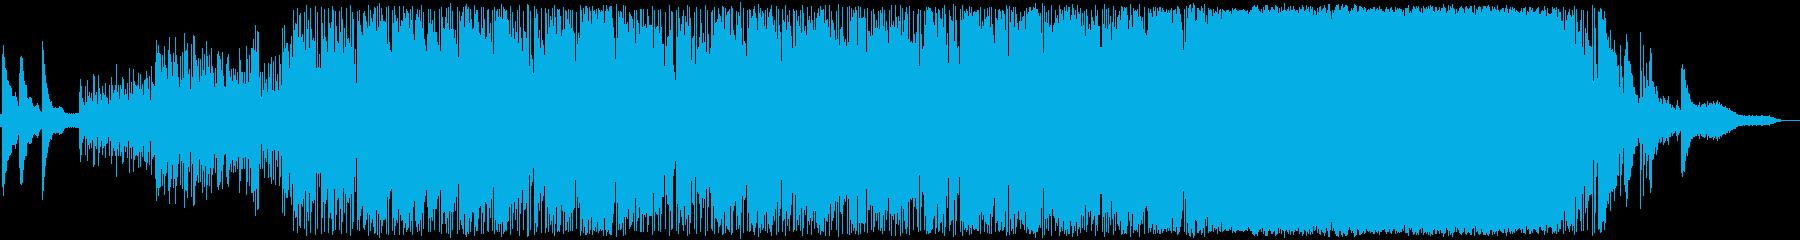 FLIP!の再生済みの波形